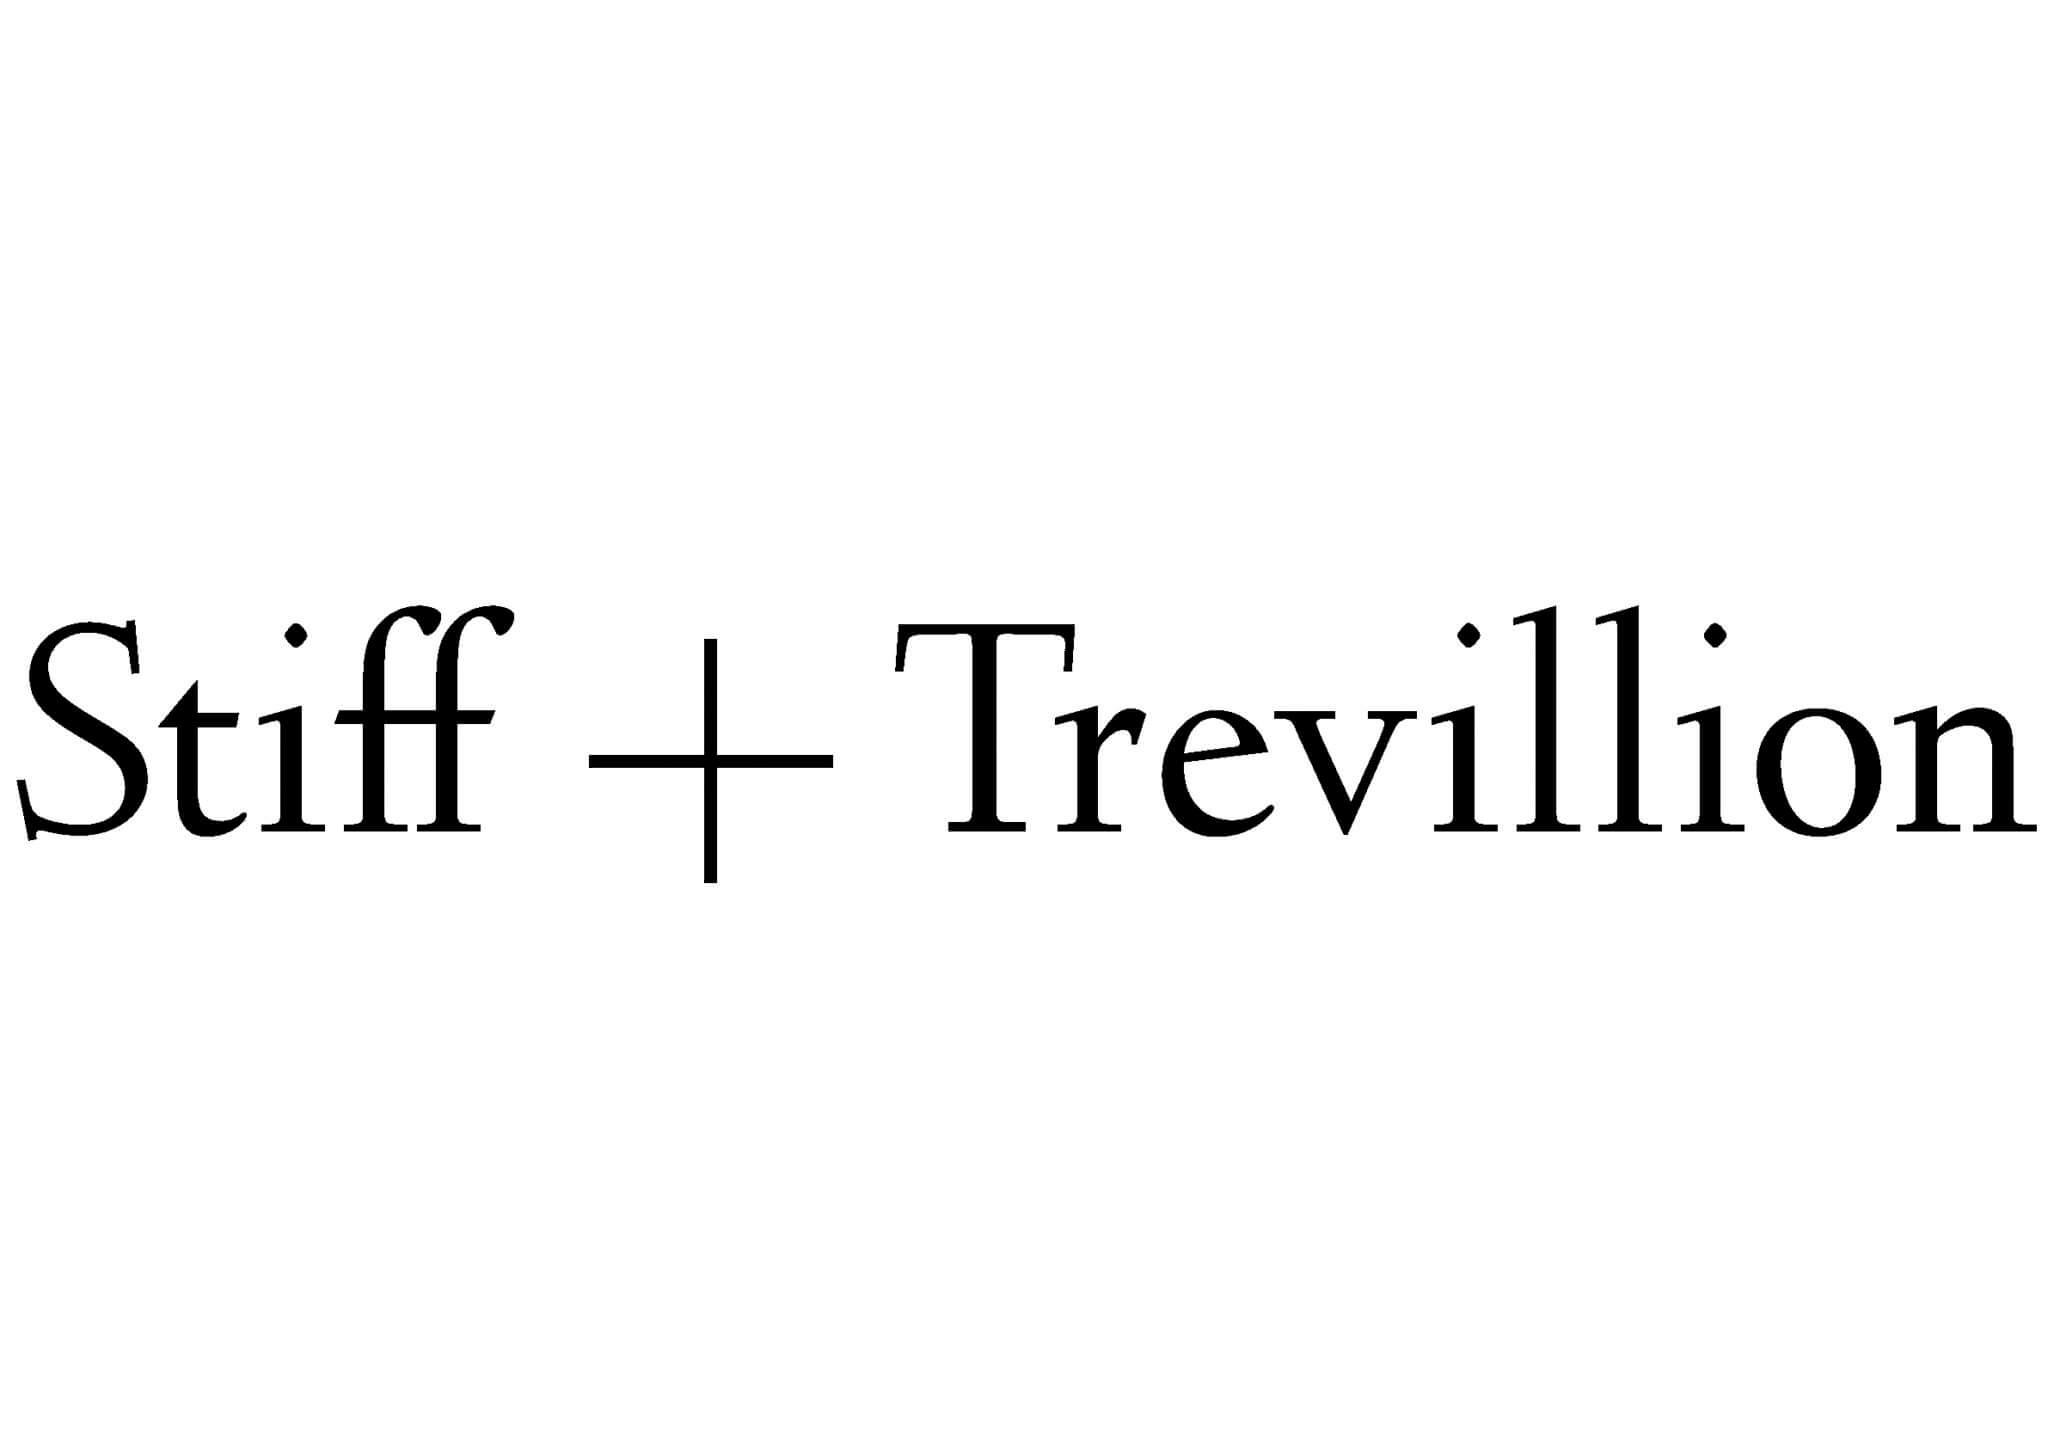 Stiff and trevillion